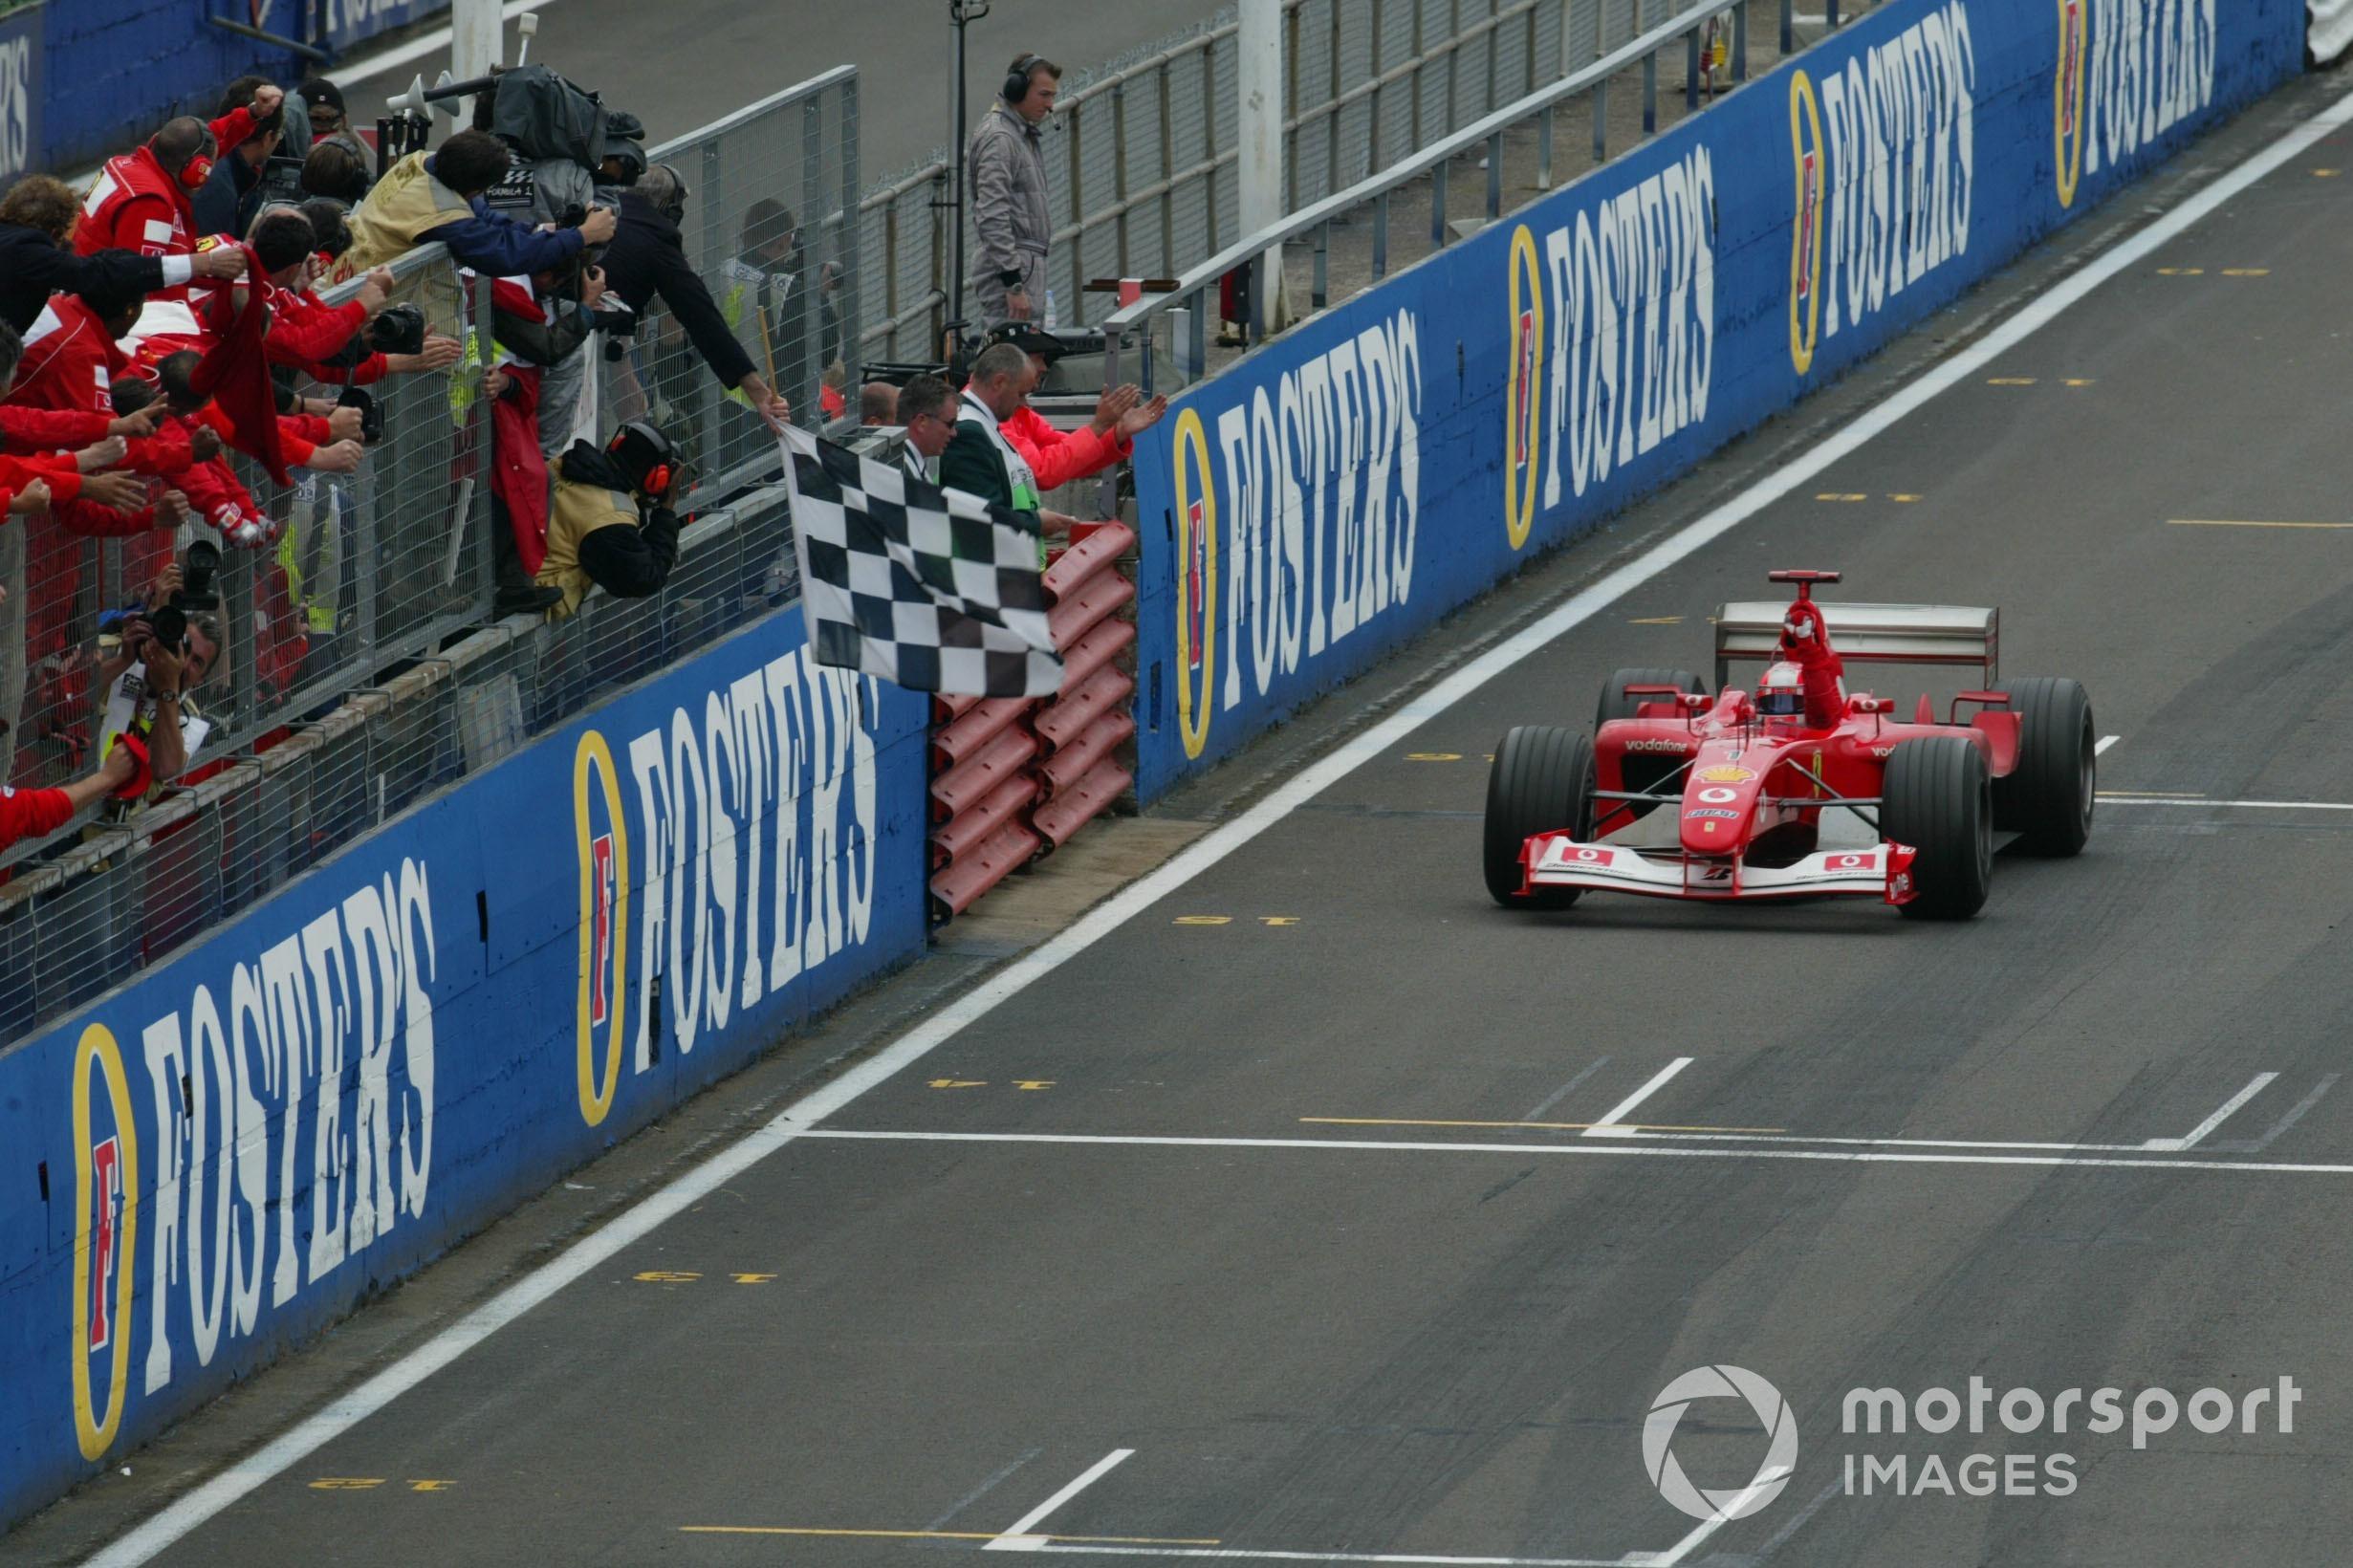 Walker retired from commentating just as Schumacher dominance got under way